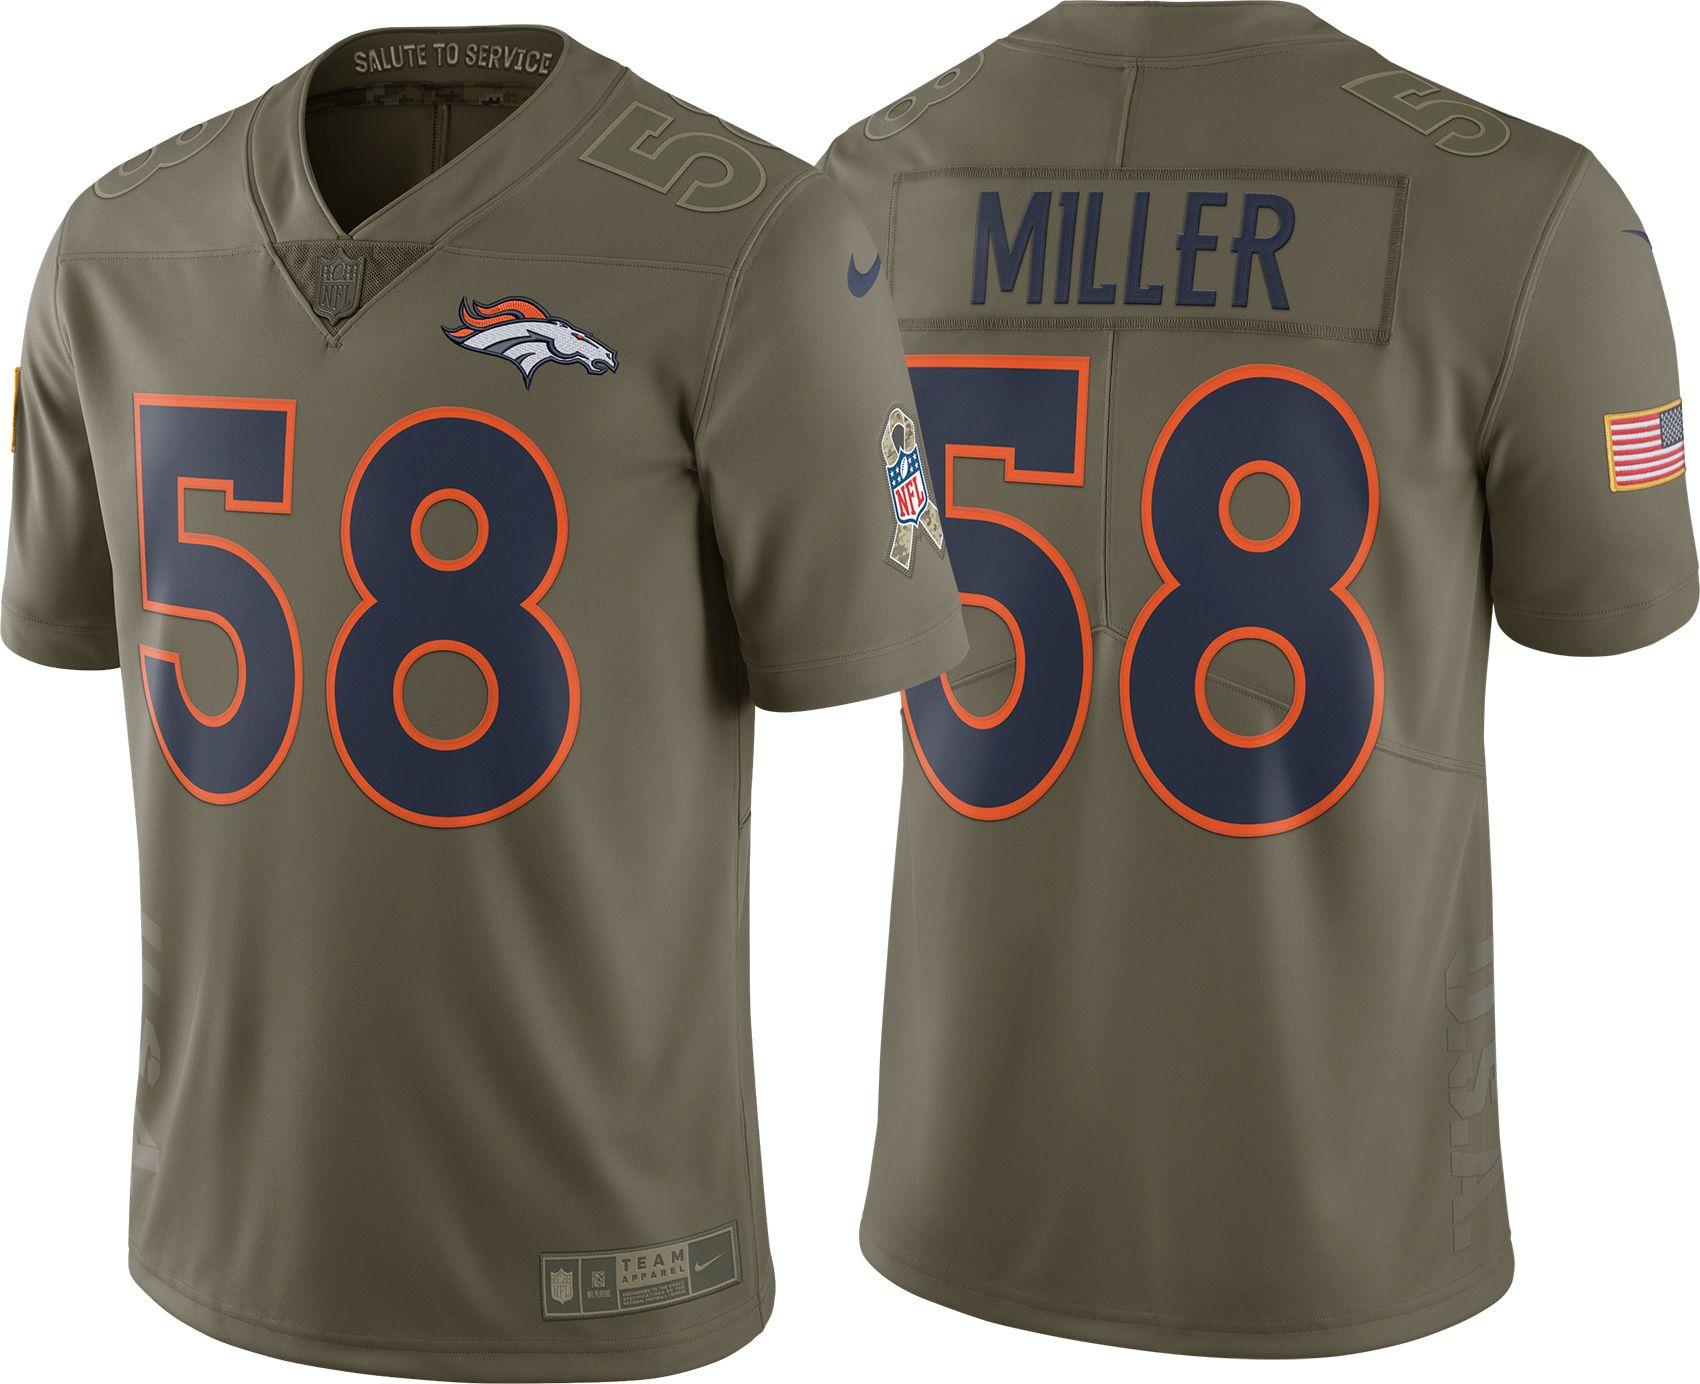 2628c3f7 Broncos Shirts For Men | RLDM